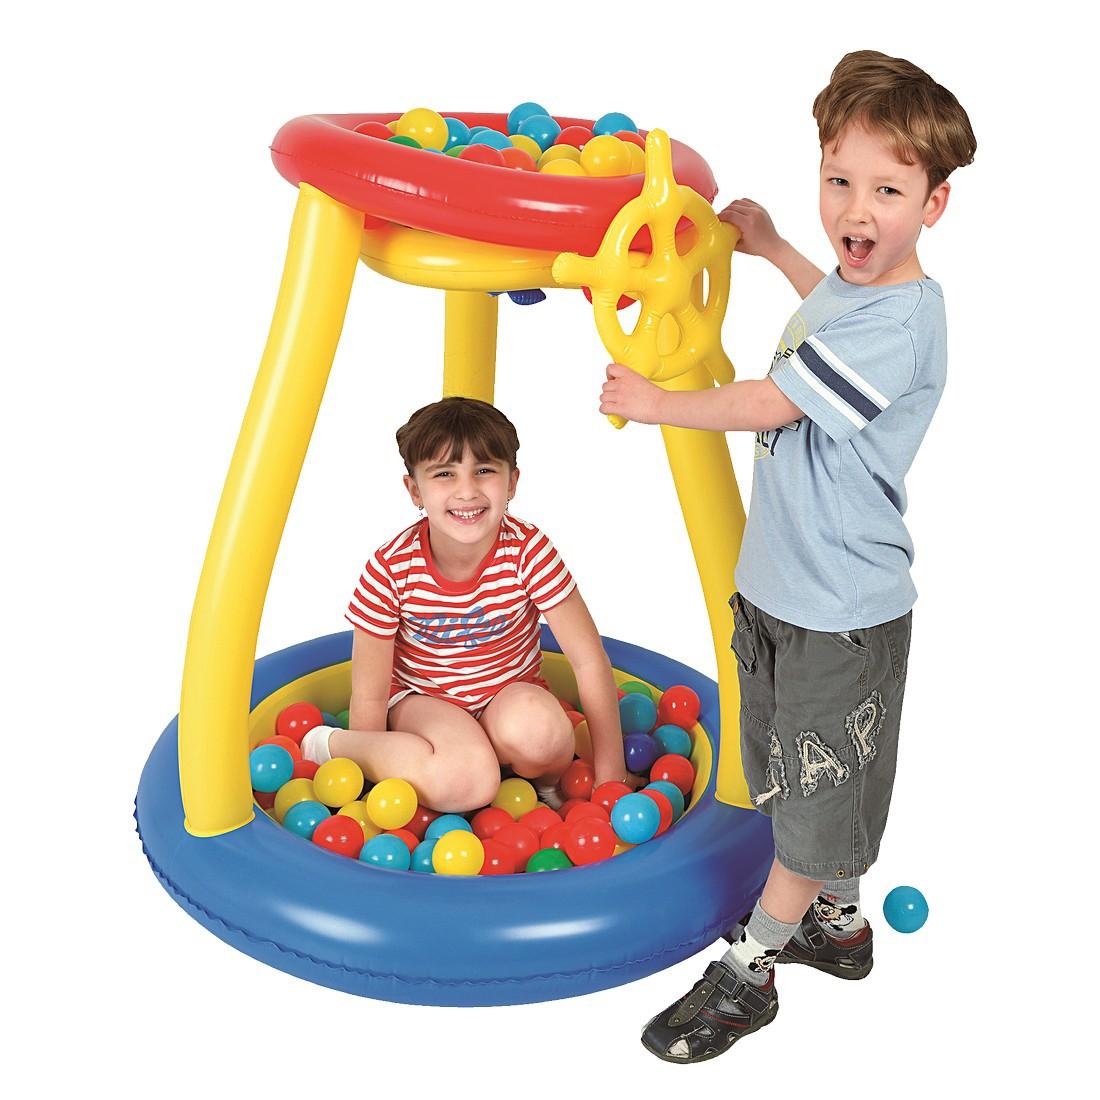 jilong pit ball play pool b llebad ballpool f r kinder inkl 25 b lle f r kinder ab 3 jahre. Black Bedroom Furniture Sets. Home Design Ideas